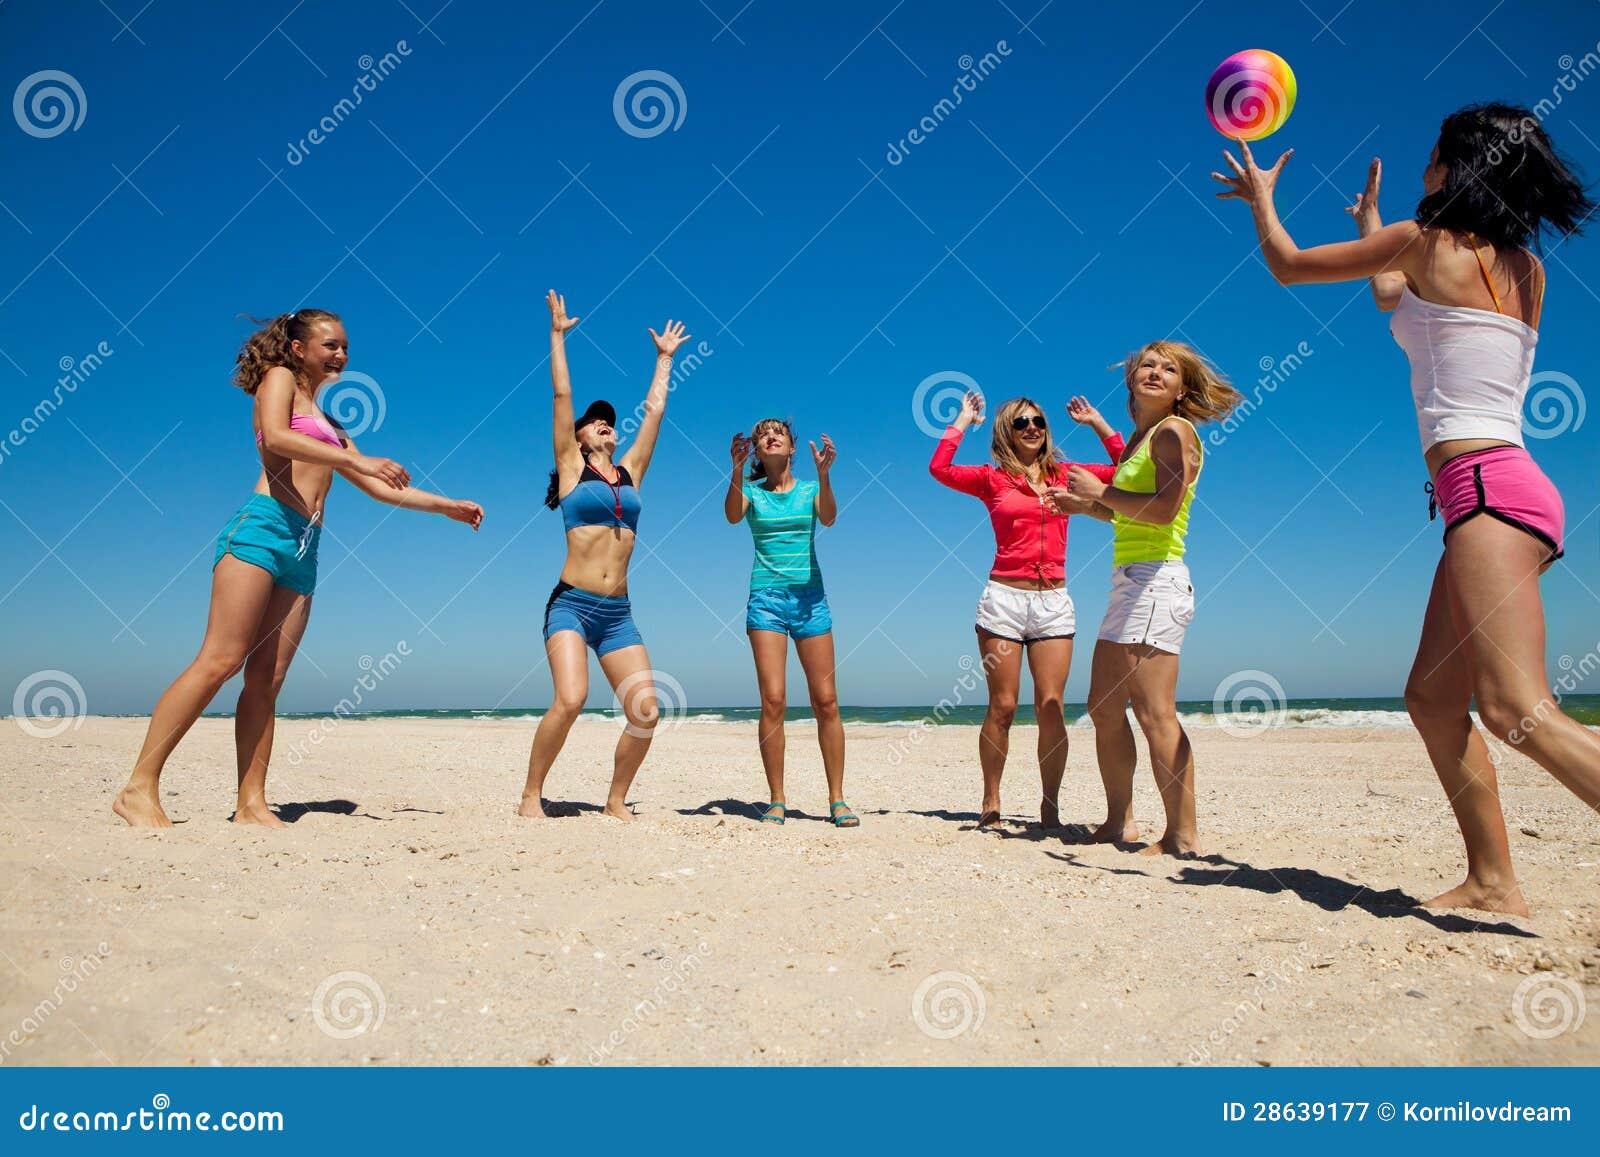 Group Young Joyful Girls Playing Volleyball On Beach Stock